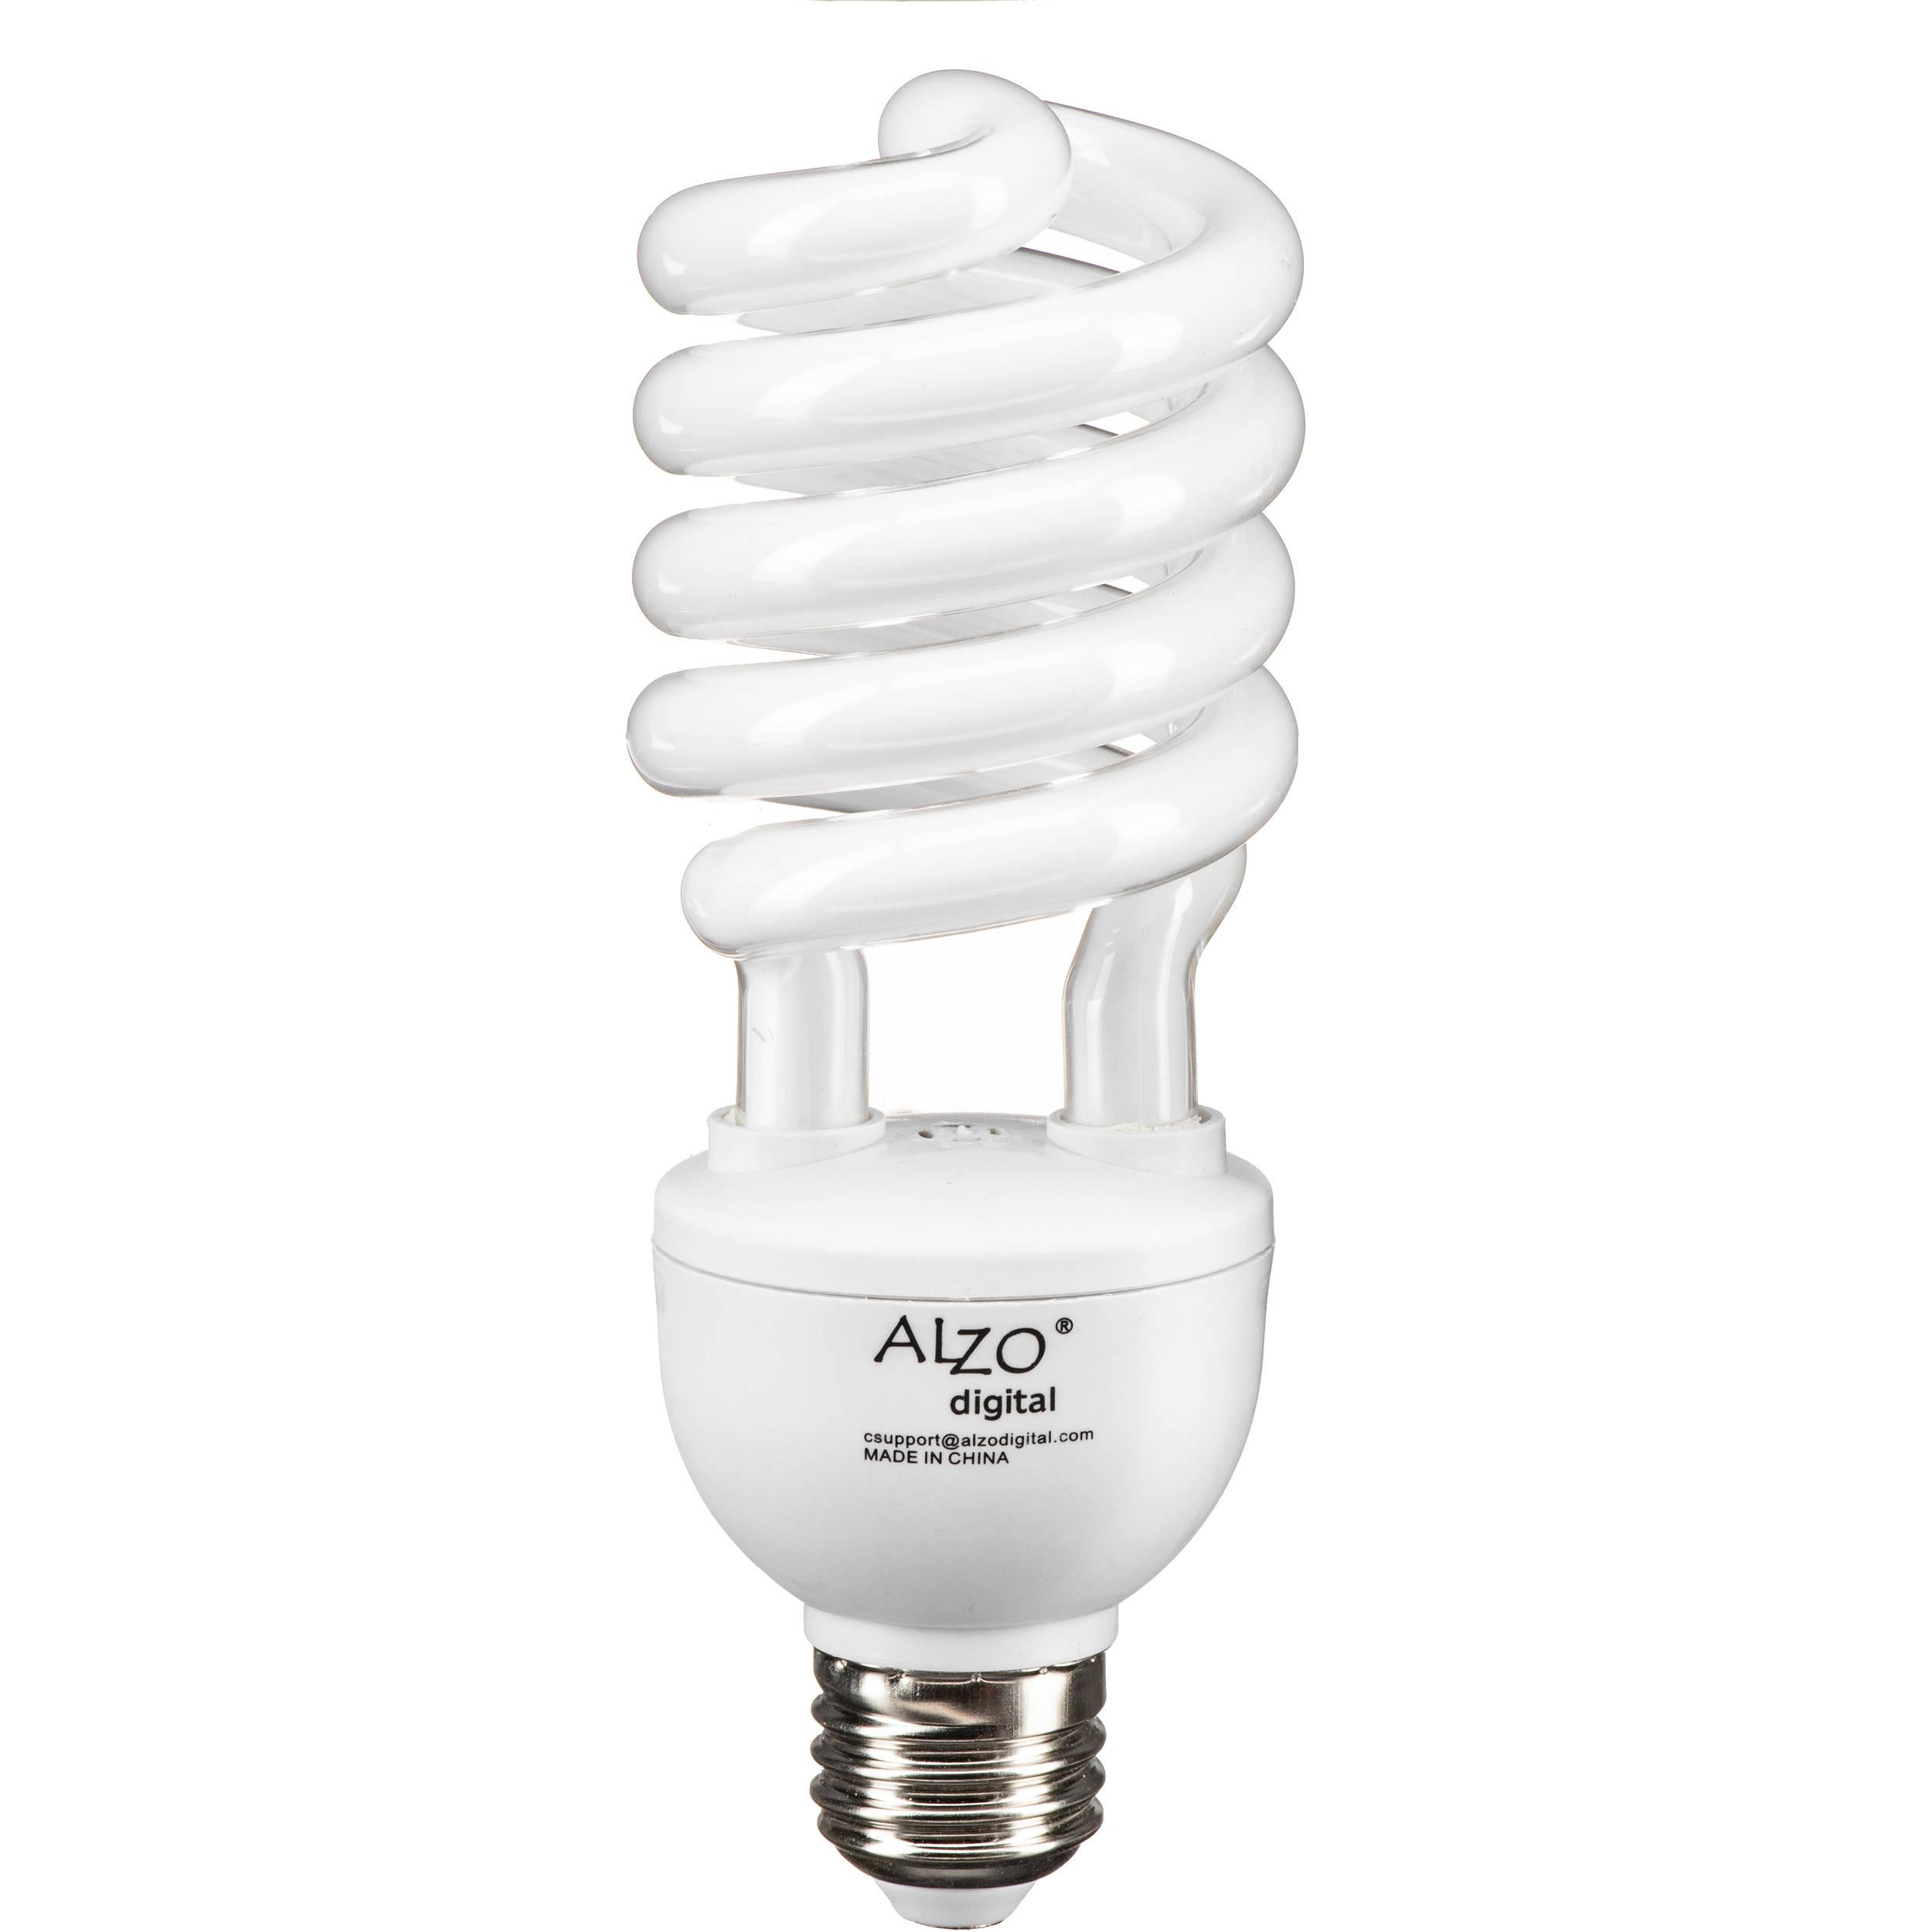 Alzo Cfl Video Lux Photo Light Bulb 27w 120v